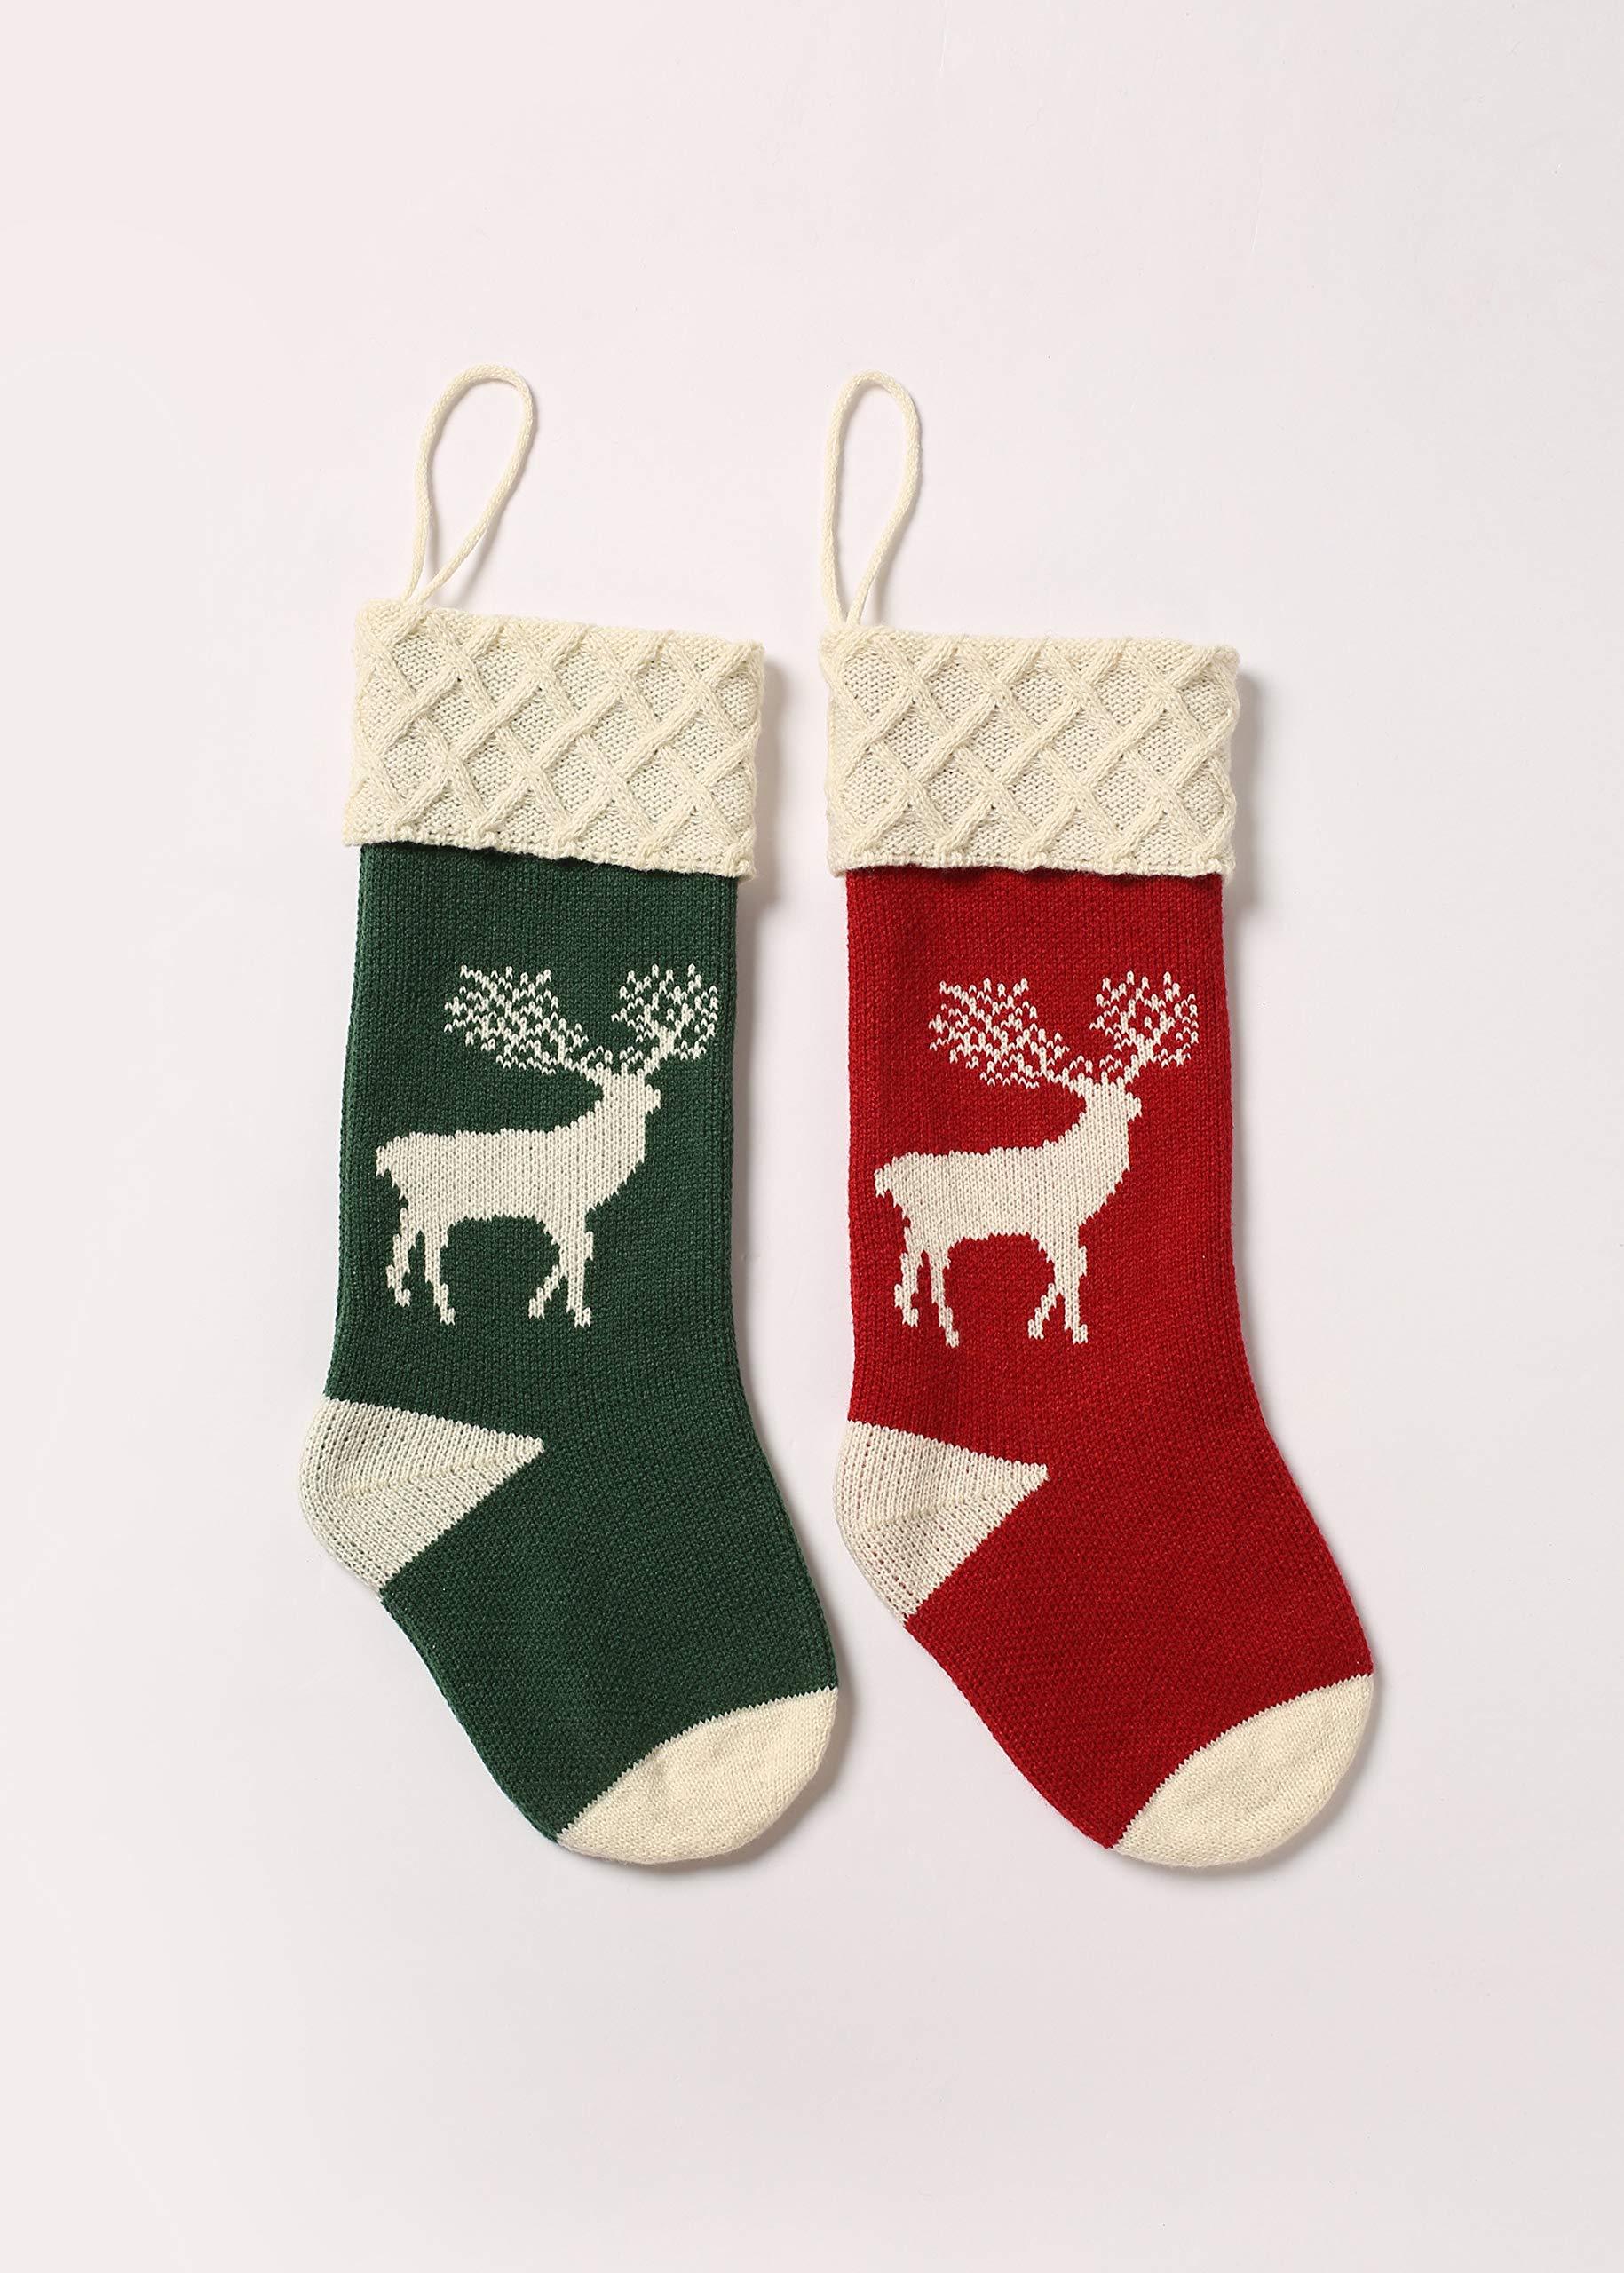 Christmas Stocking Set of 4, Xmas Sock Sack Gift Bag for Tree Decoration Christmas Ornament Candy Pouch Bag Theme Reindeer 4 Pcs